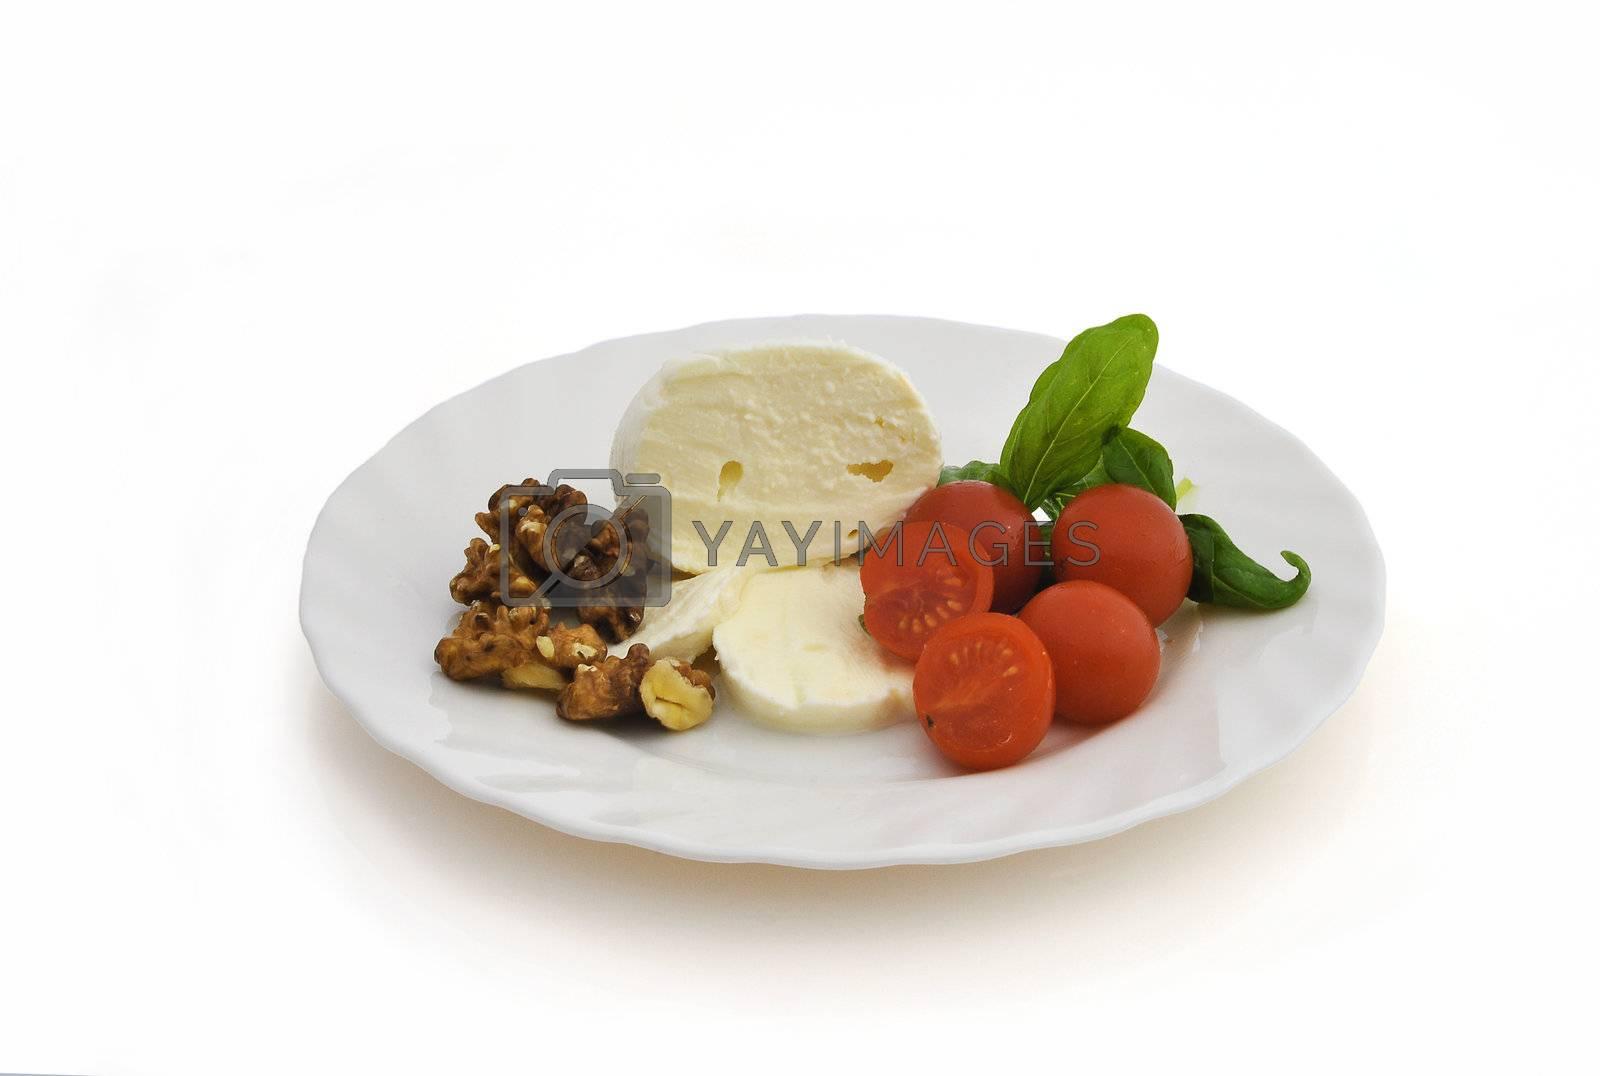 Mozzarella cherry tomatoes and walnuts on white background